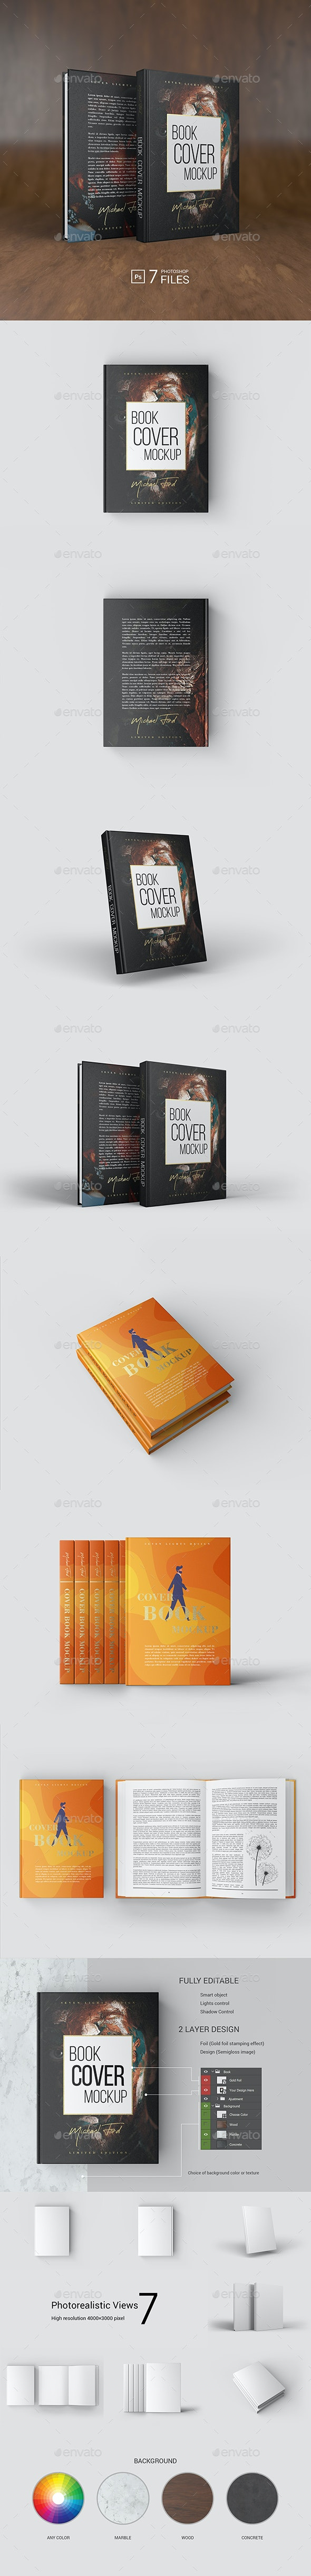 Cover Book Mockup - Books Print